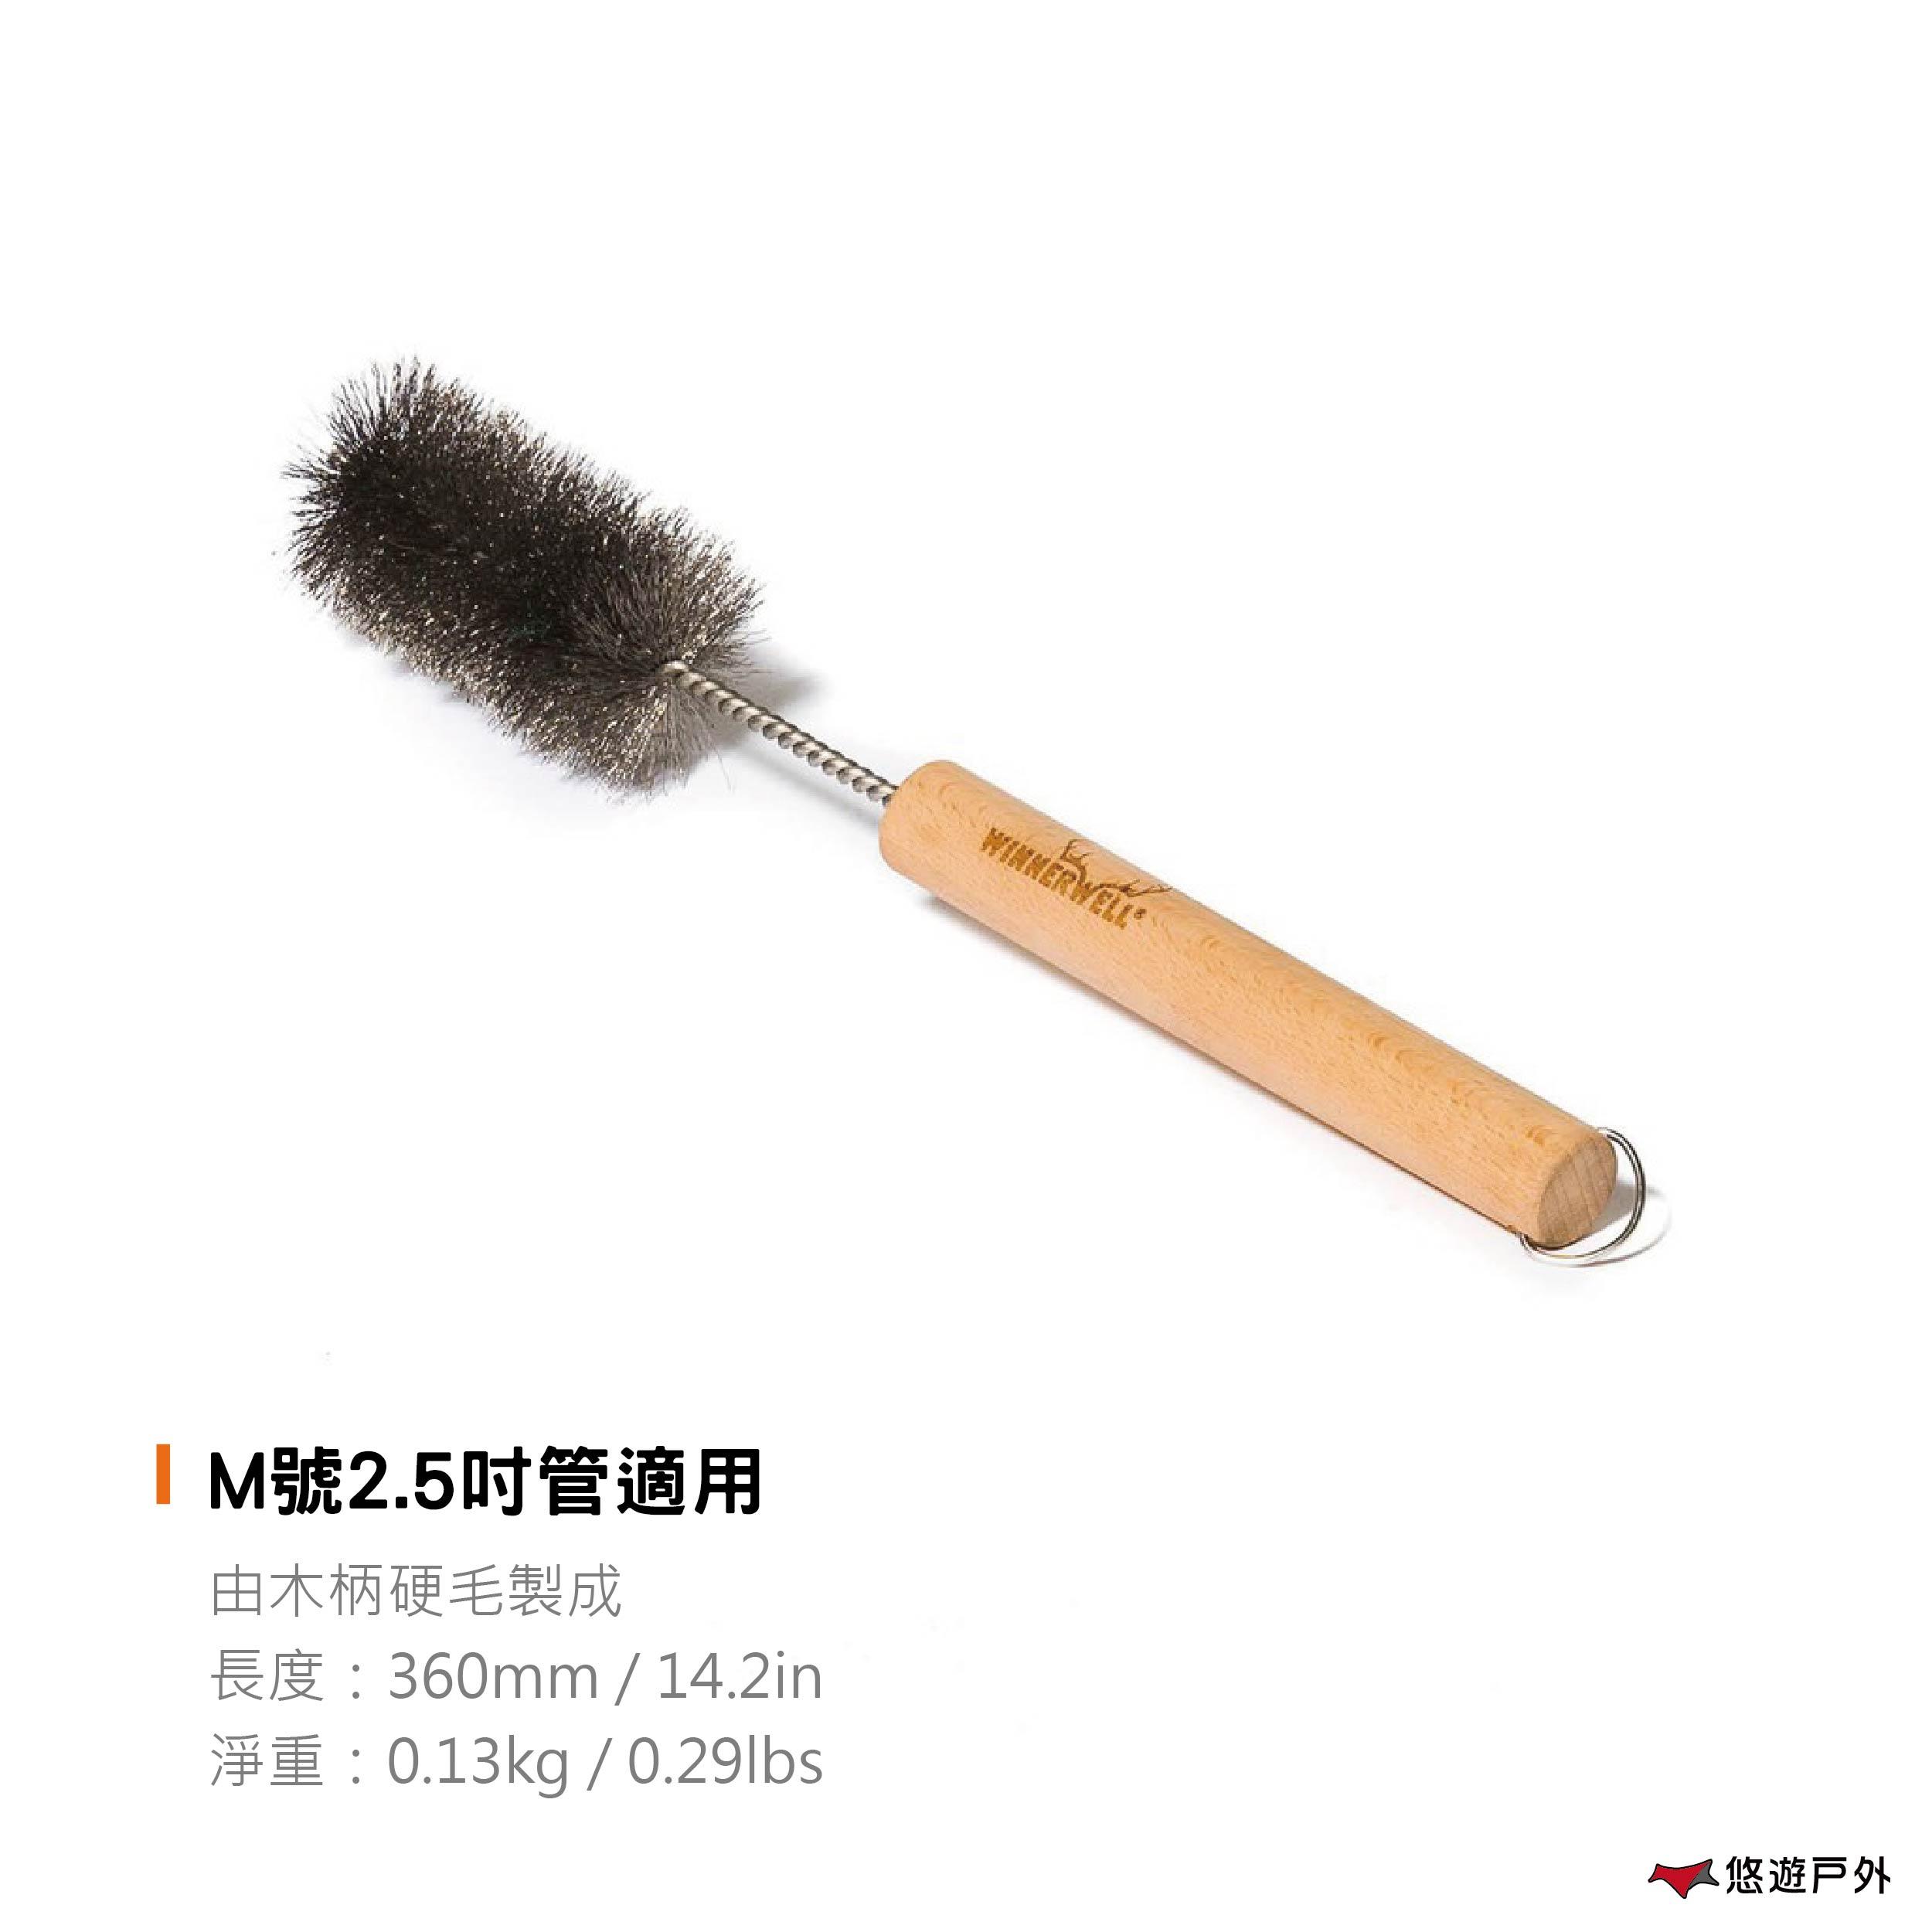 WINNERWELL 煙管刷  M/L號 910323 柴爐 周邊配件